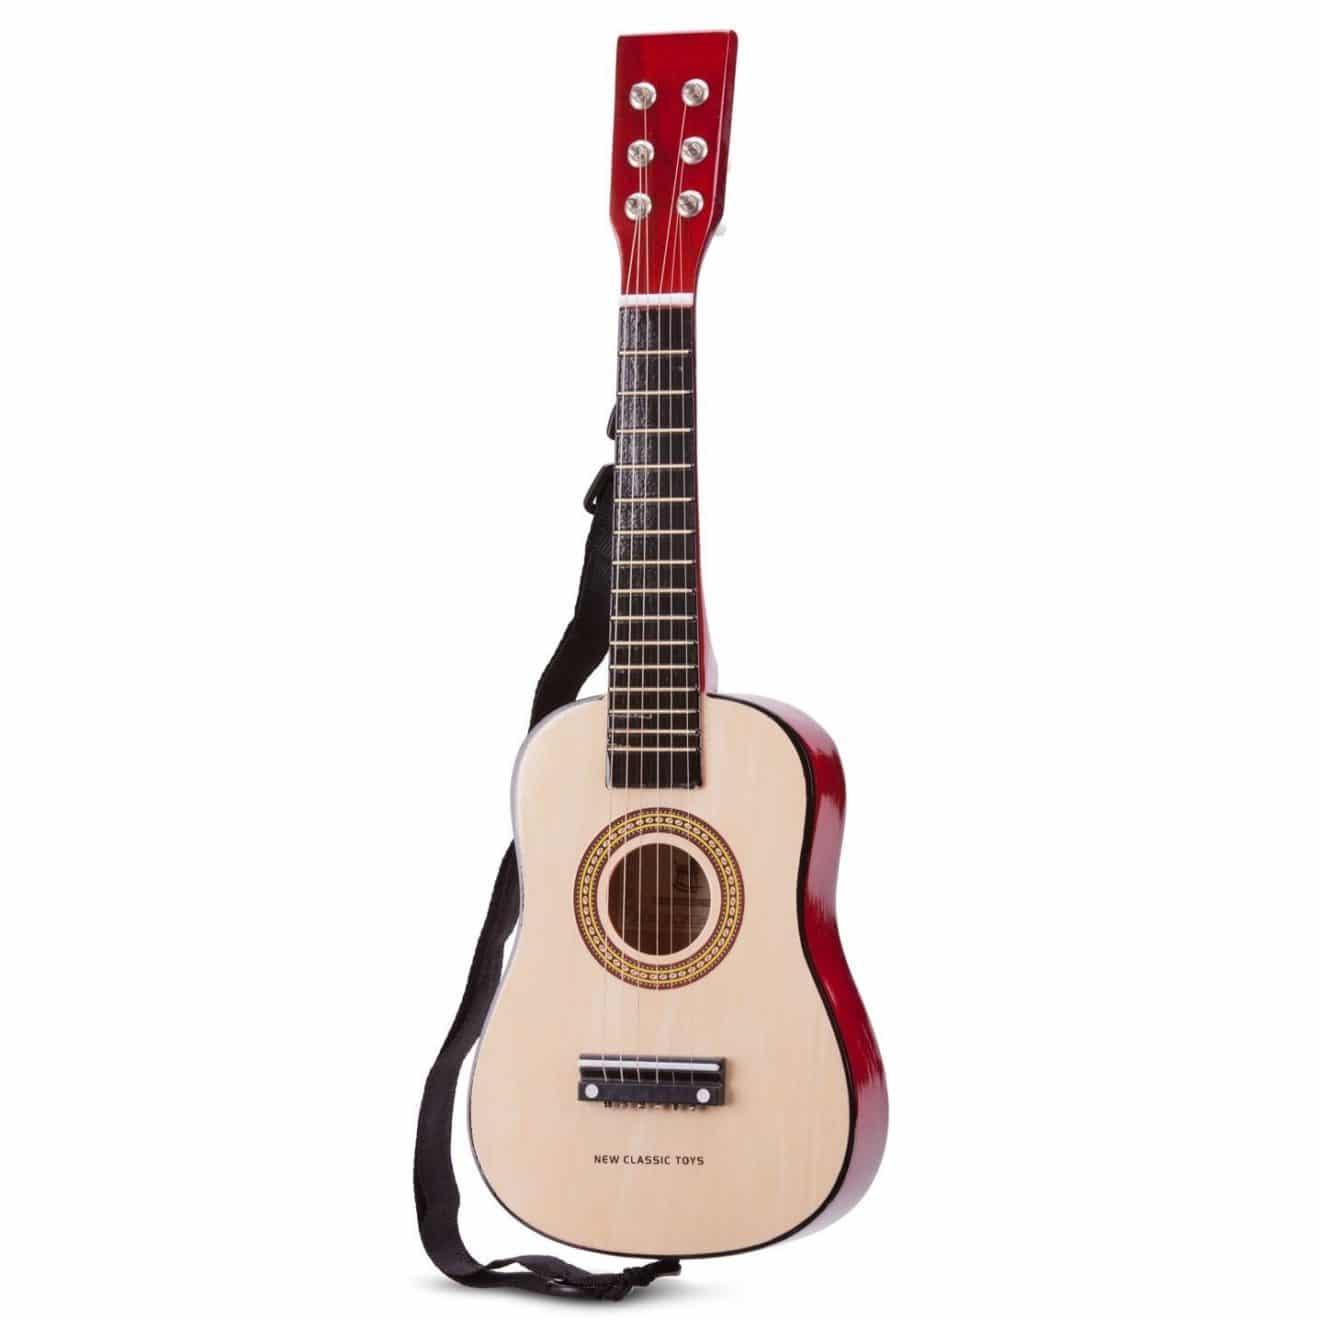 Guitare New Classic Toys